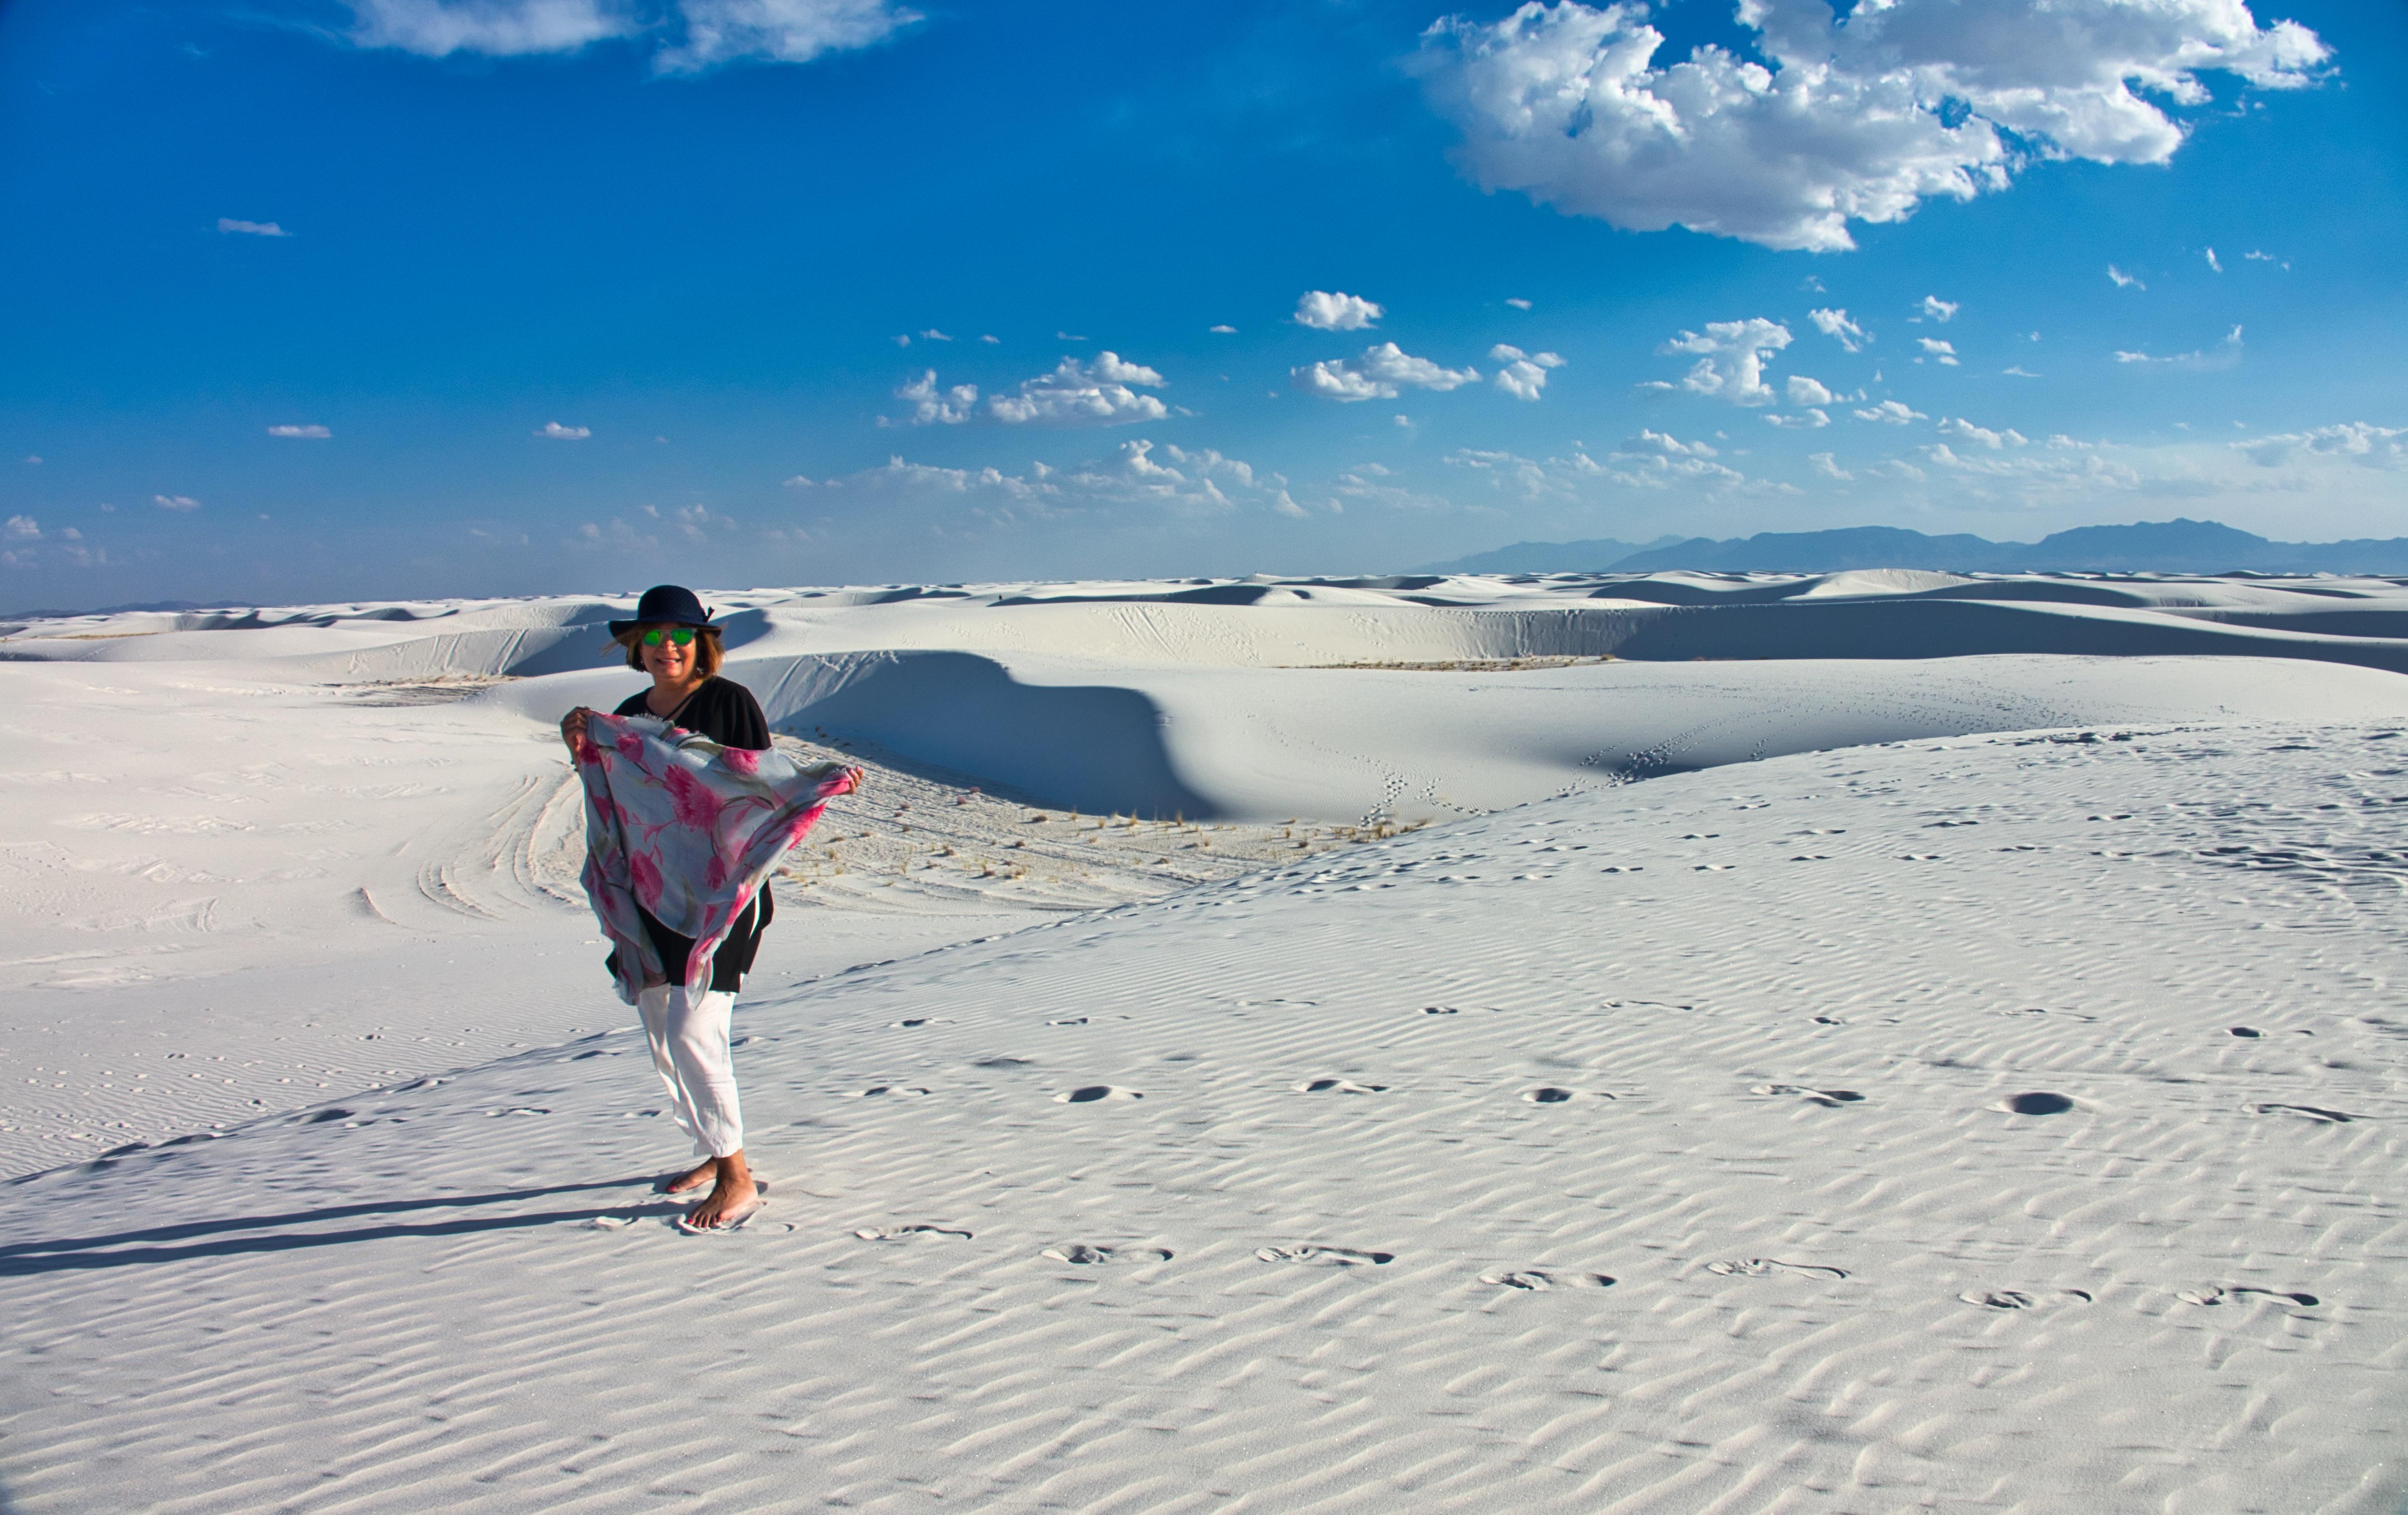 Vast Gypsum dunes